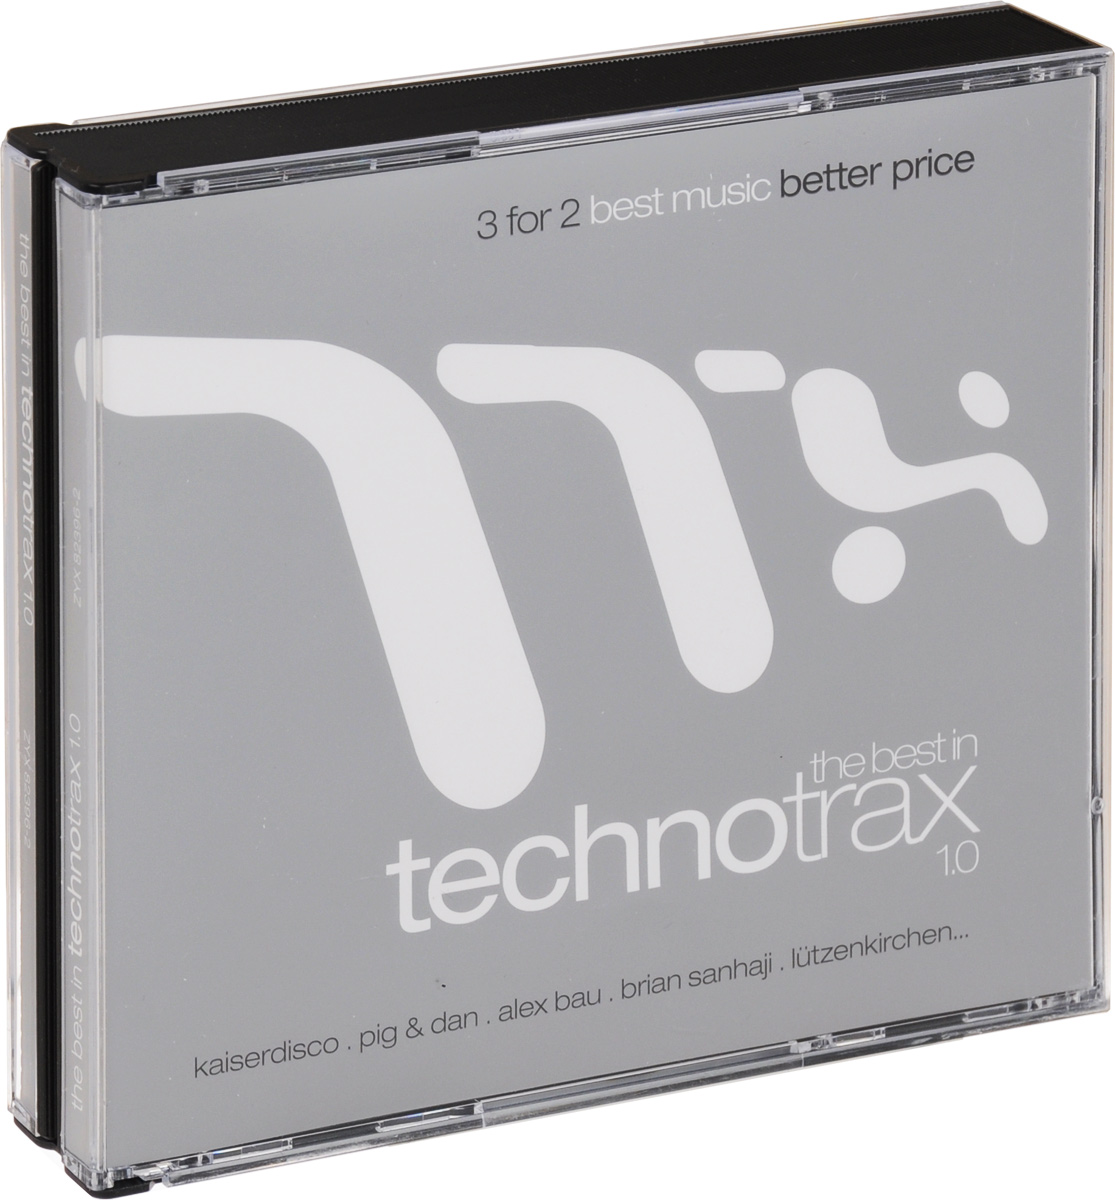 The Best In Technotrax 1.0 (3 CD) михаил плетнев филип лейджер роджер норрингтон джон нельсон сабин мейер best adagios 50 3 cd